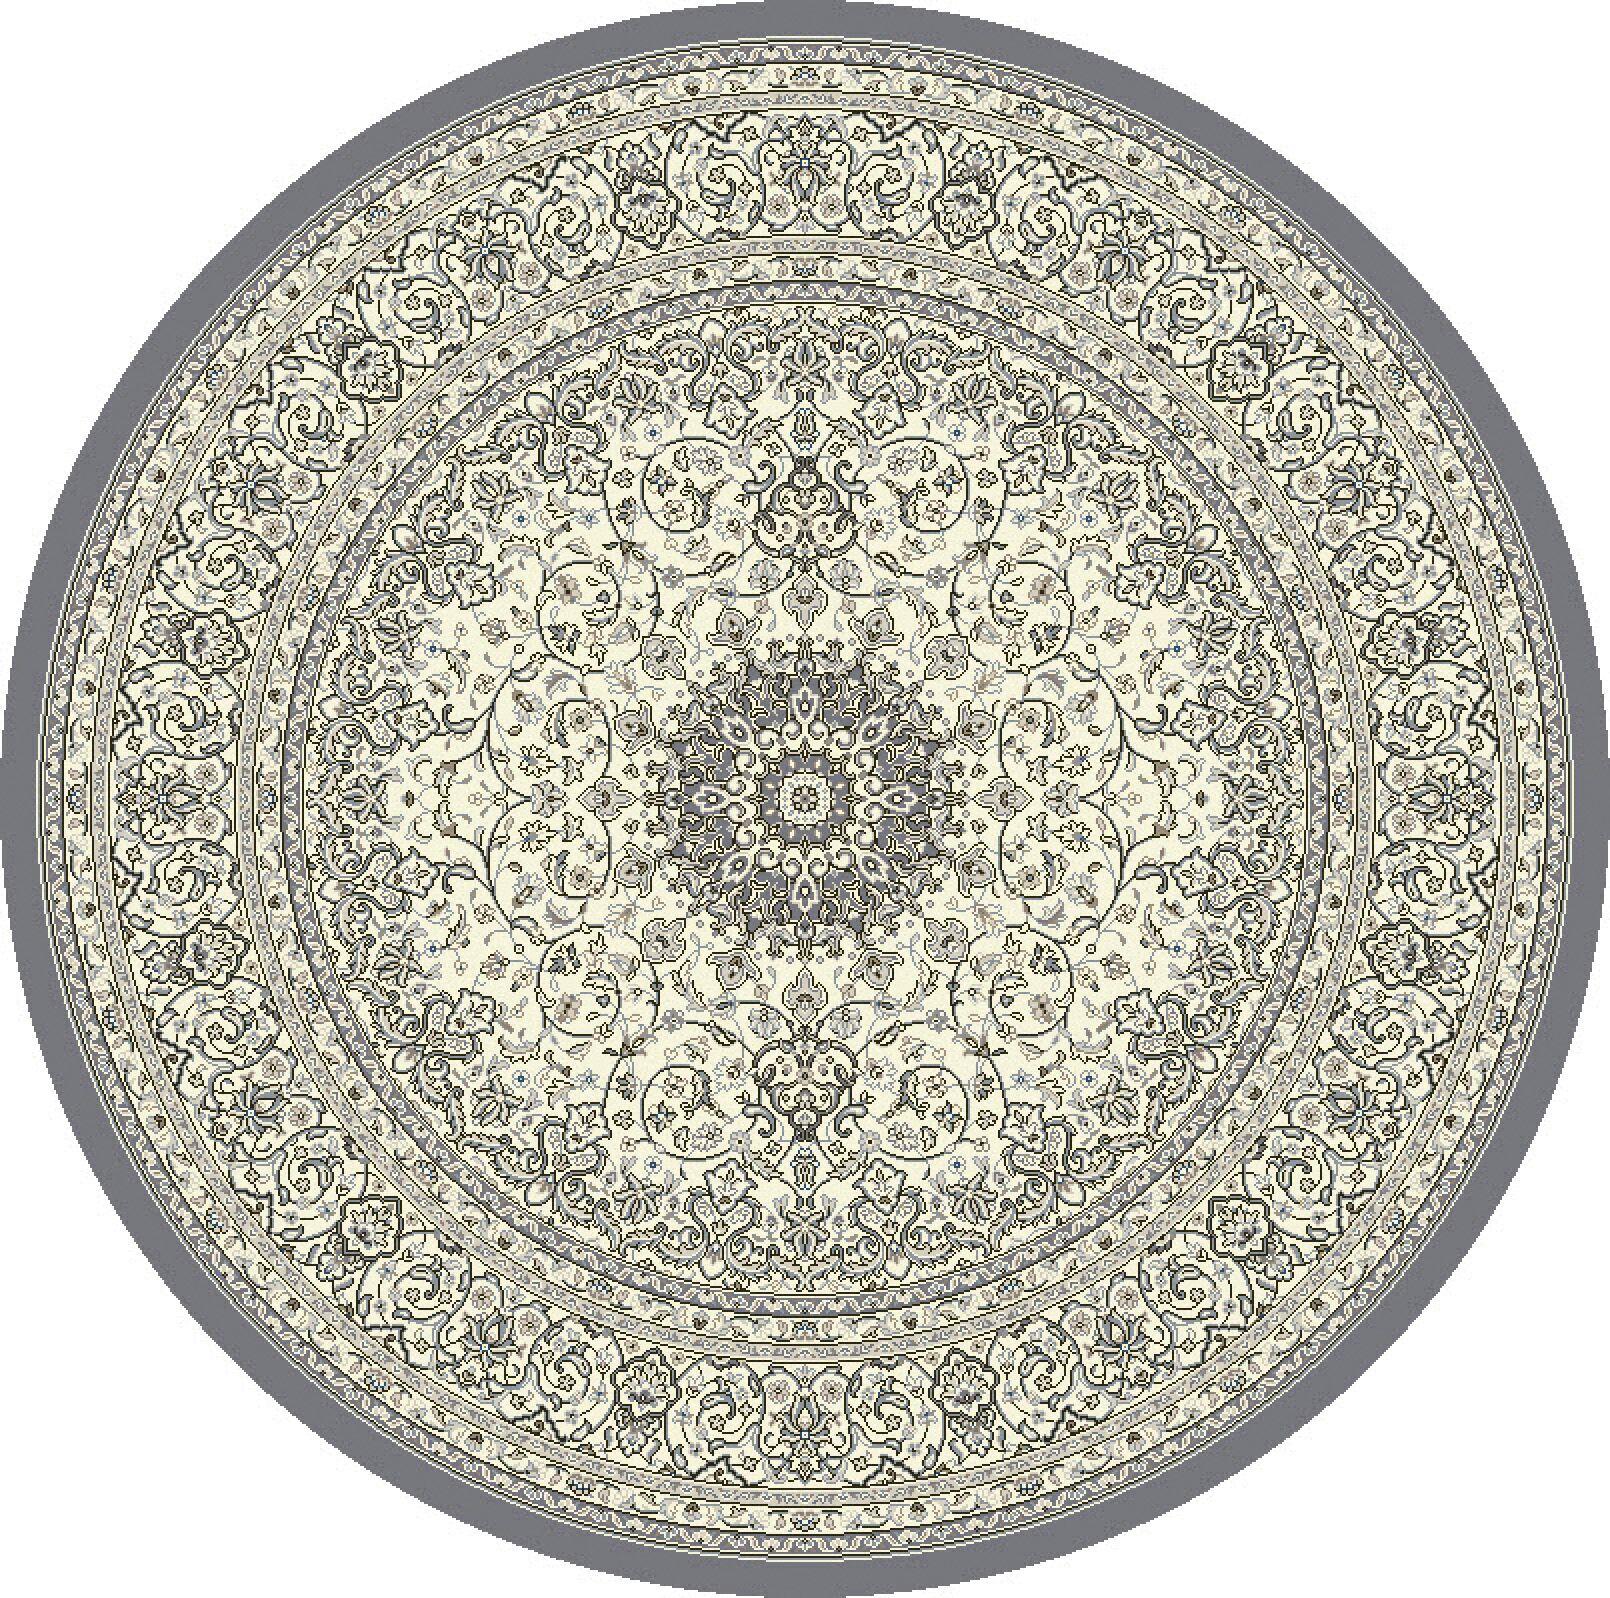 Attell Gray/Cream Area Rug Rug Size: Round 7'10